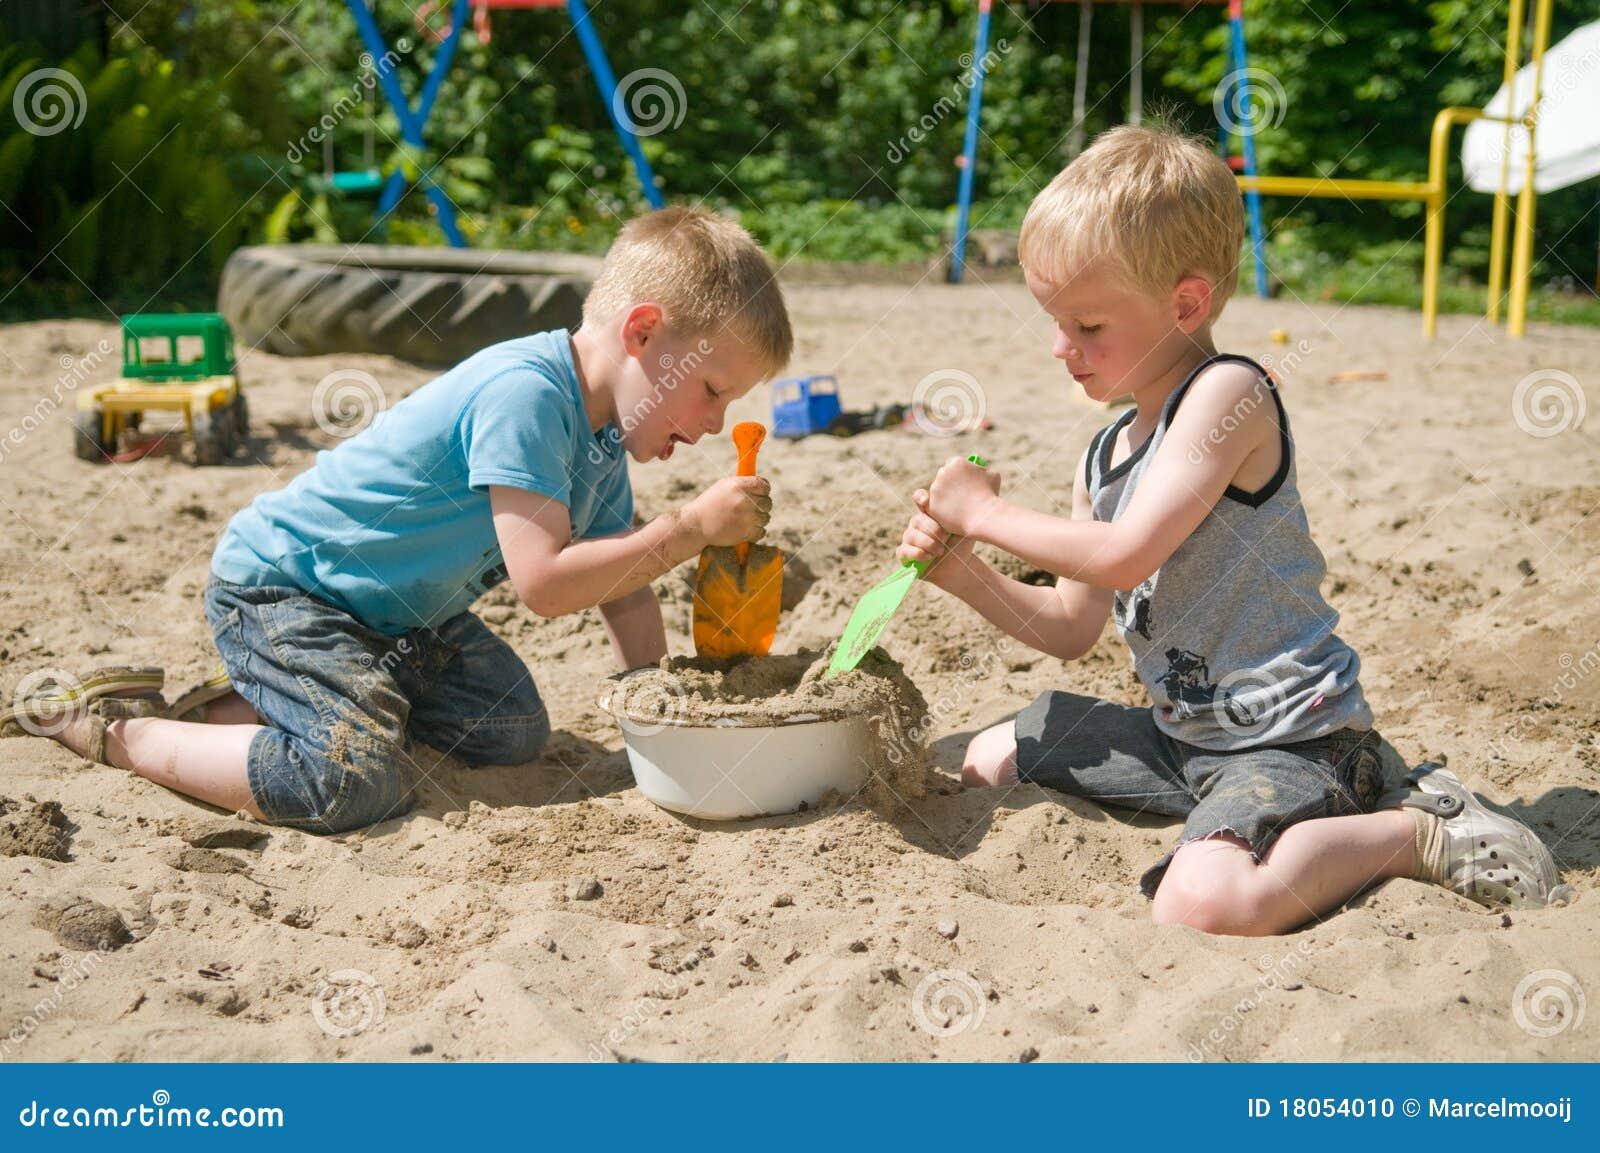 Kids Sandbox Plans